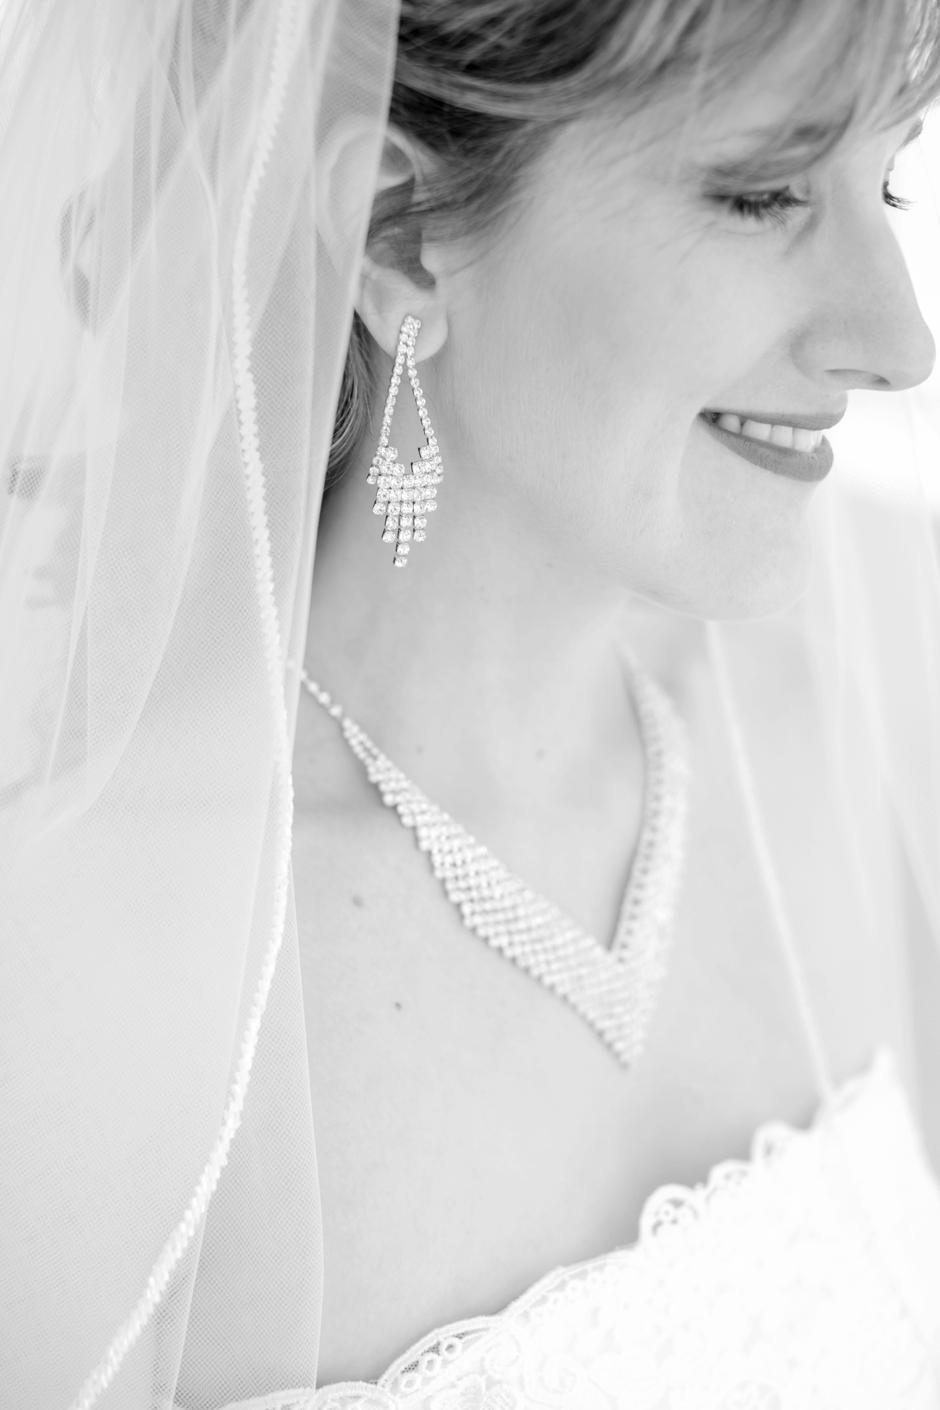 lawrenceburg-ky-wedding-four-roses-bourbon-074.jpg